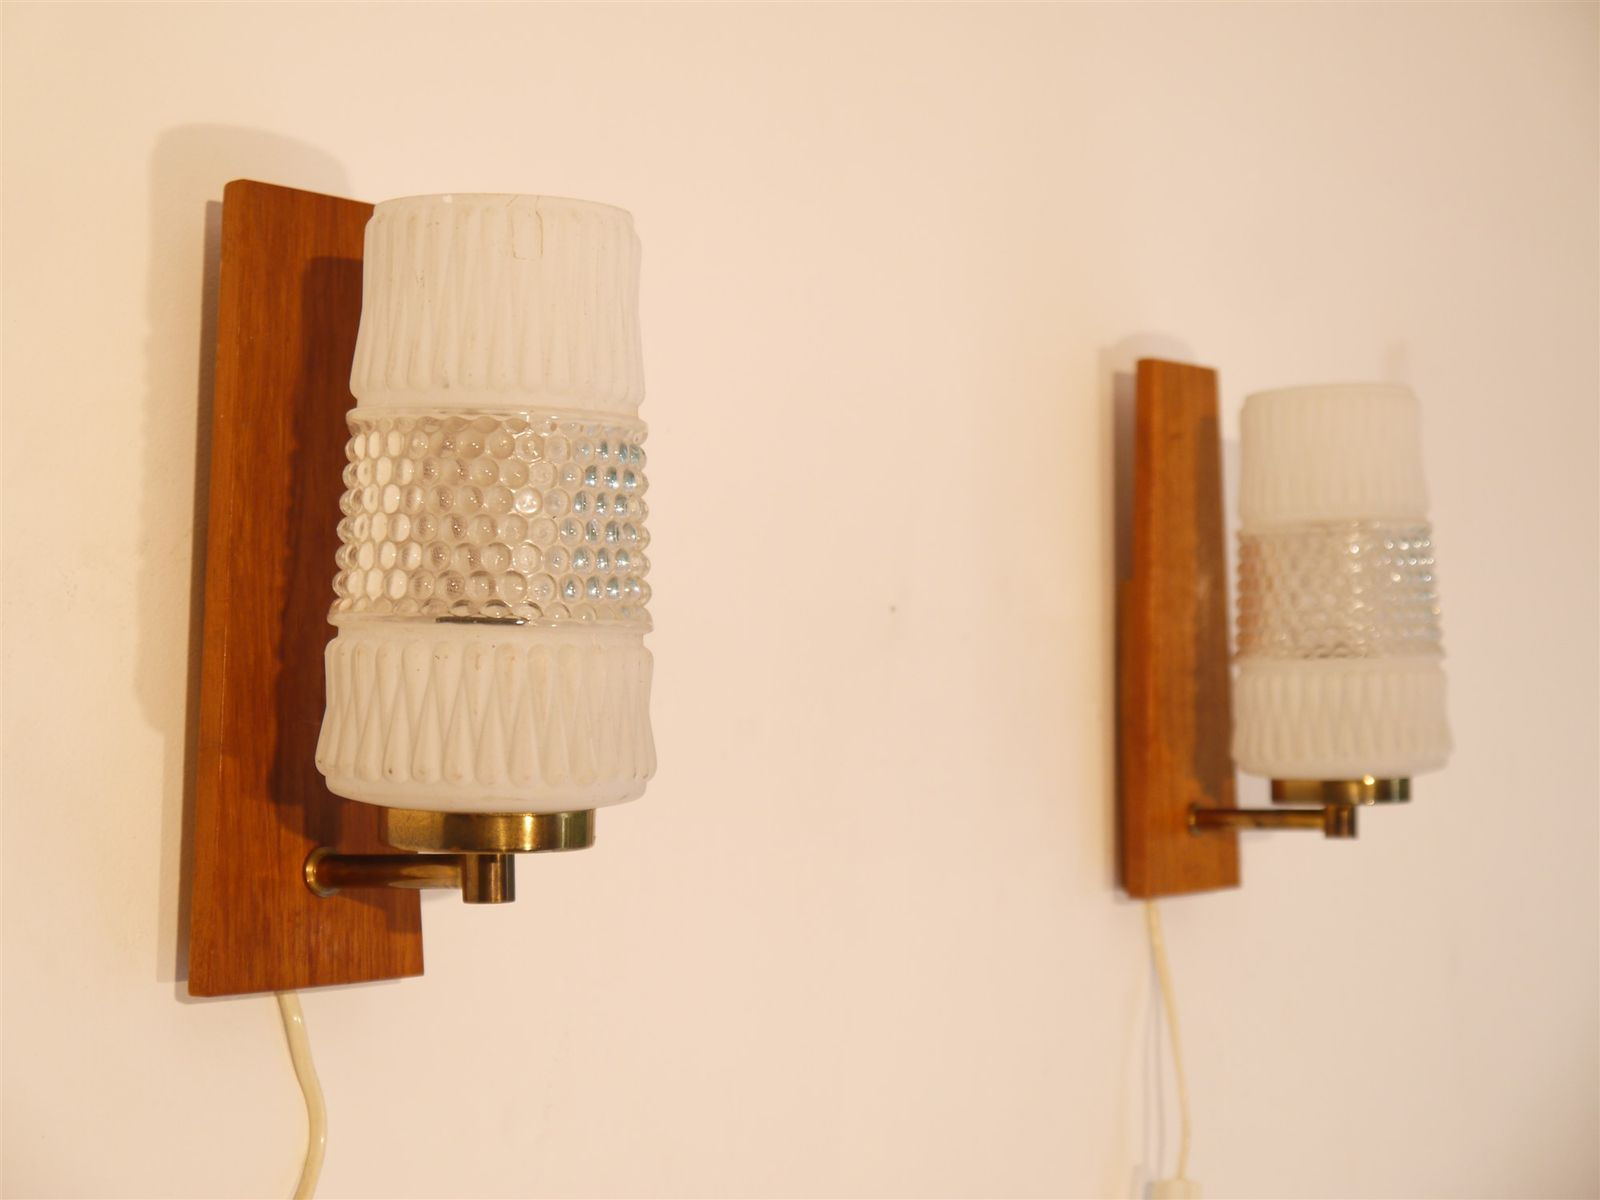 Skandinavische Vintage Wandlampen aus Teak, 1960er, 2er Set